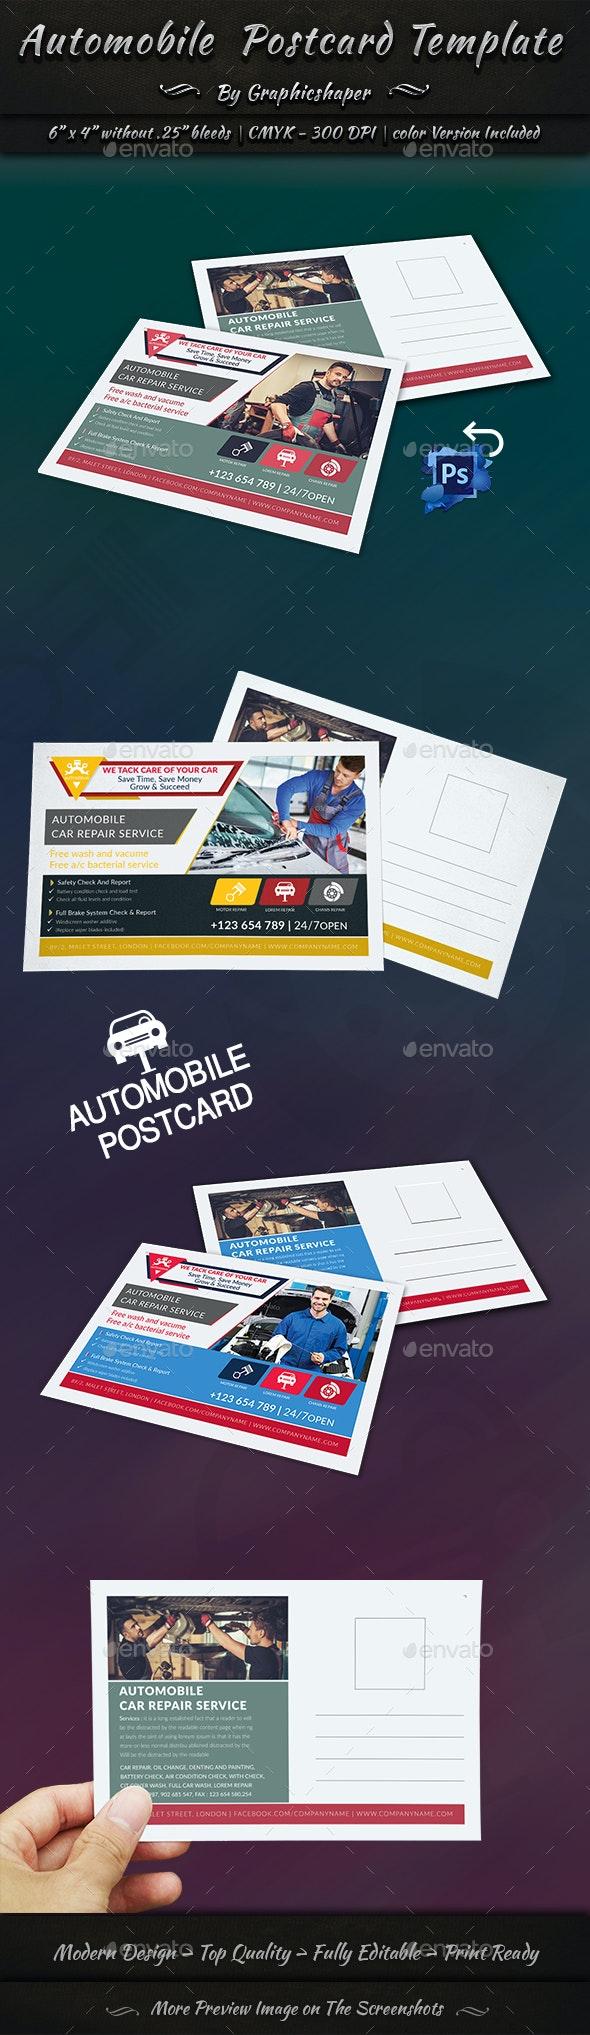 Automobile Post Card Template - Cards & Invites Print Templates